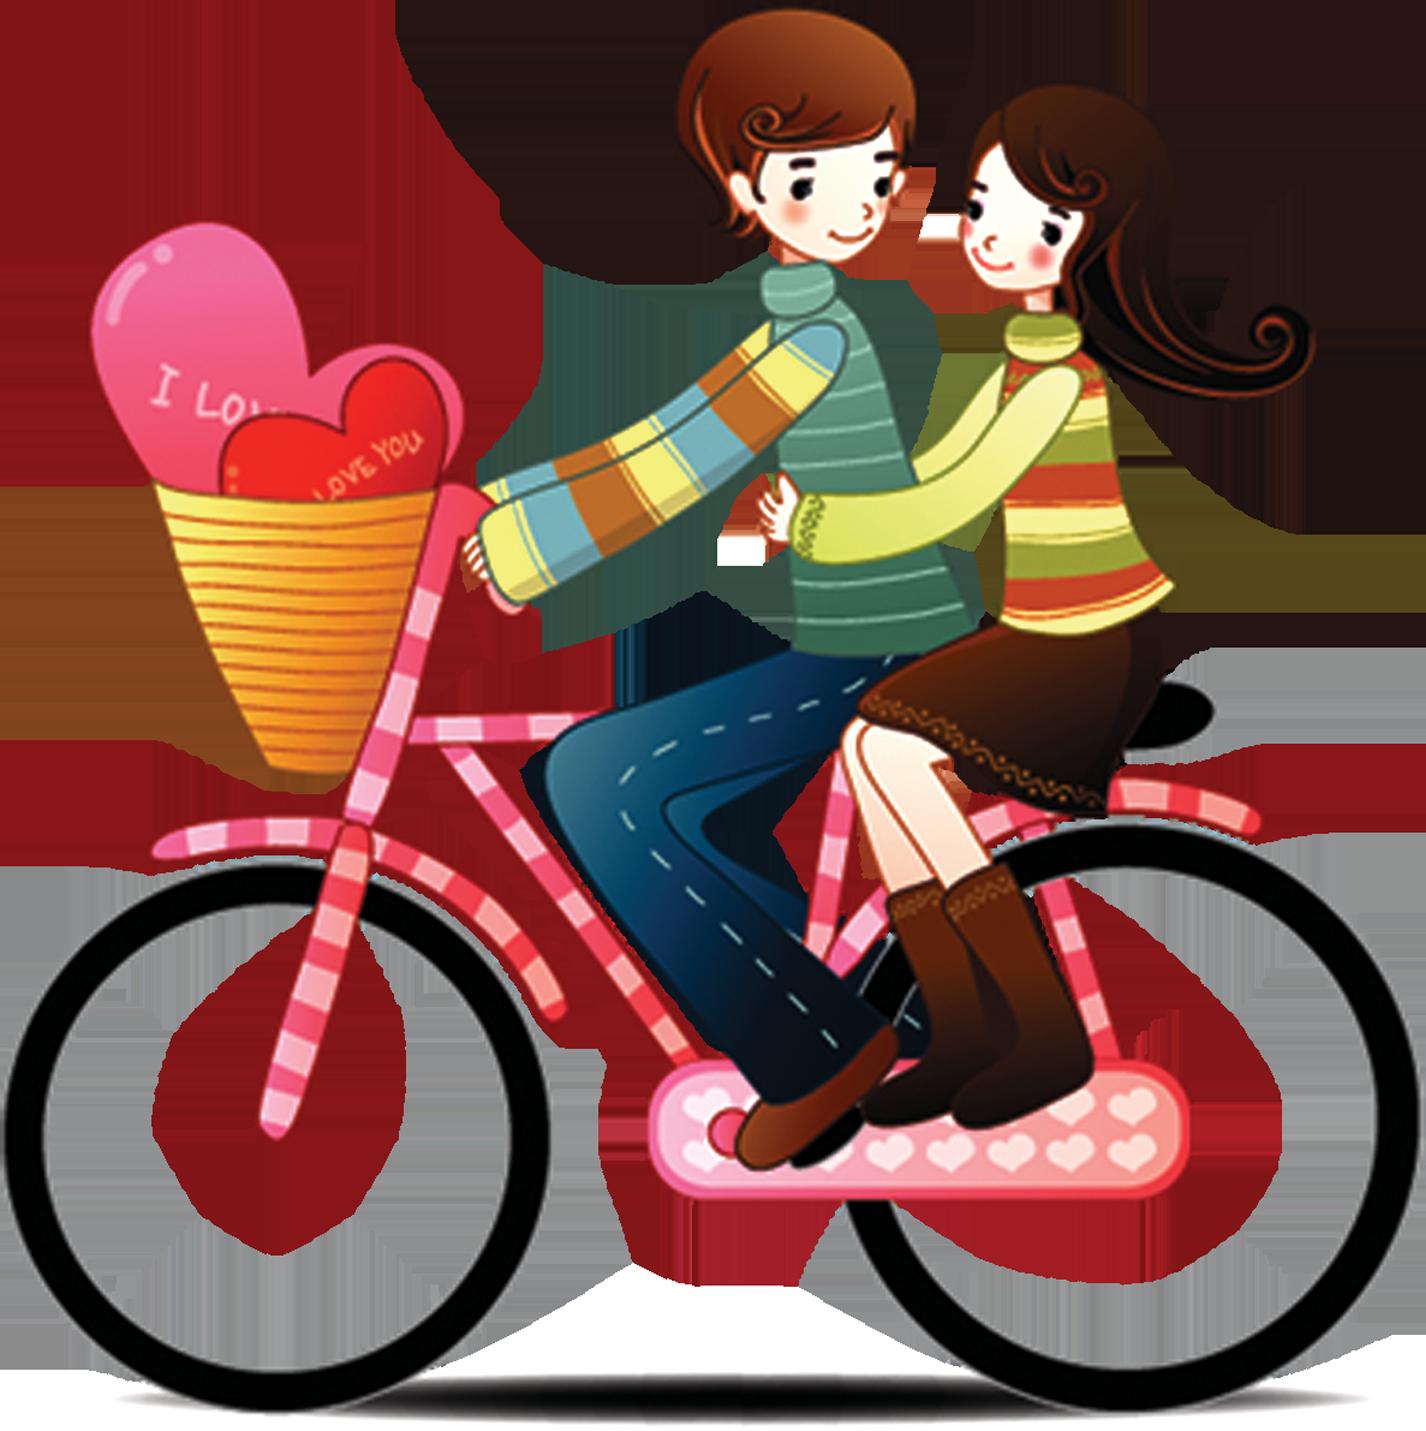 Clipart love romantic relationship. Romance couple intimate valentines